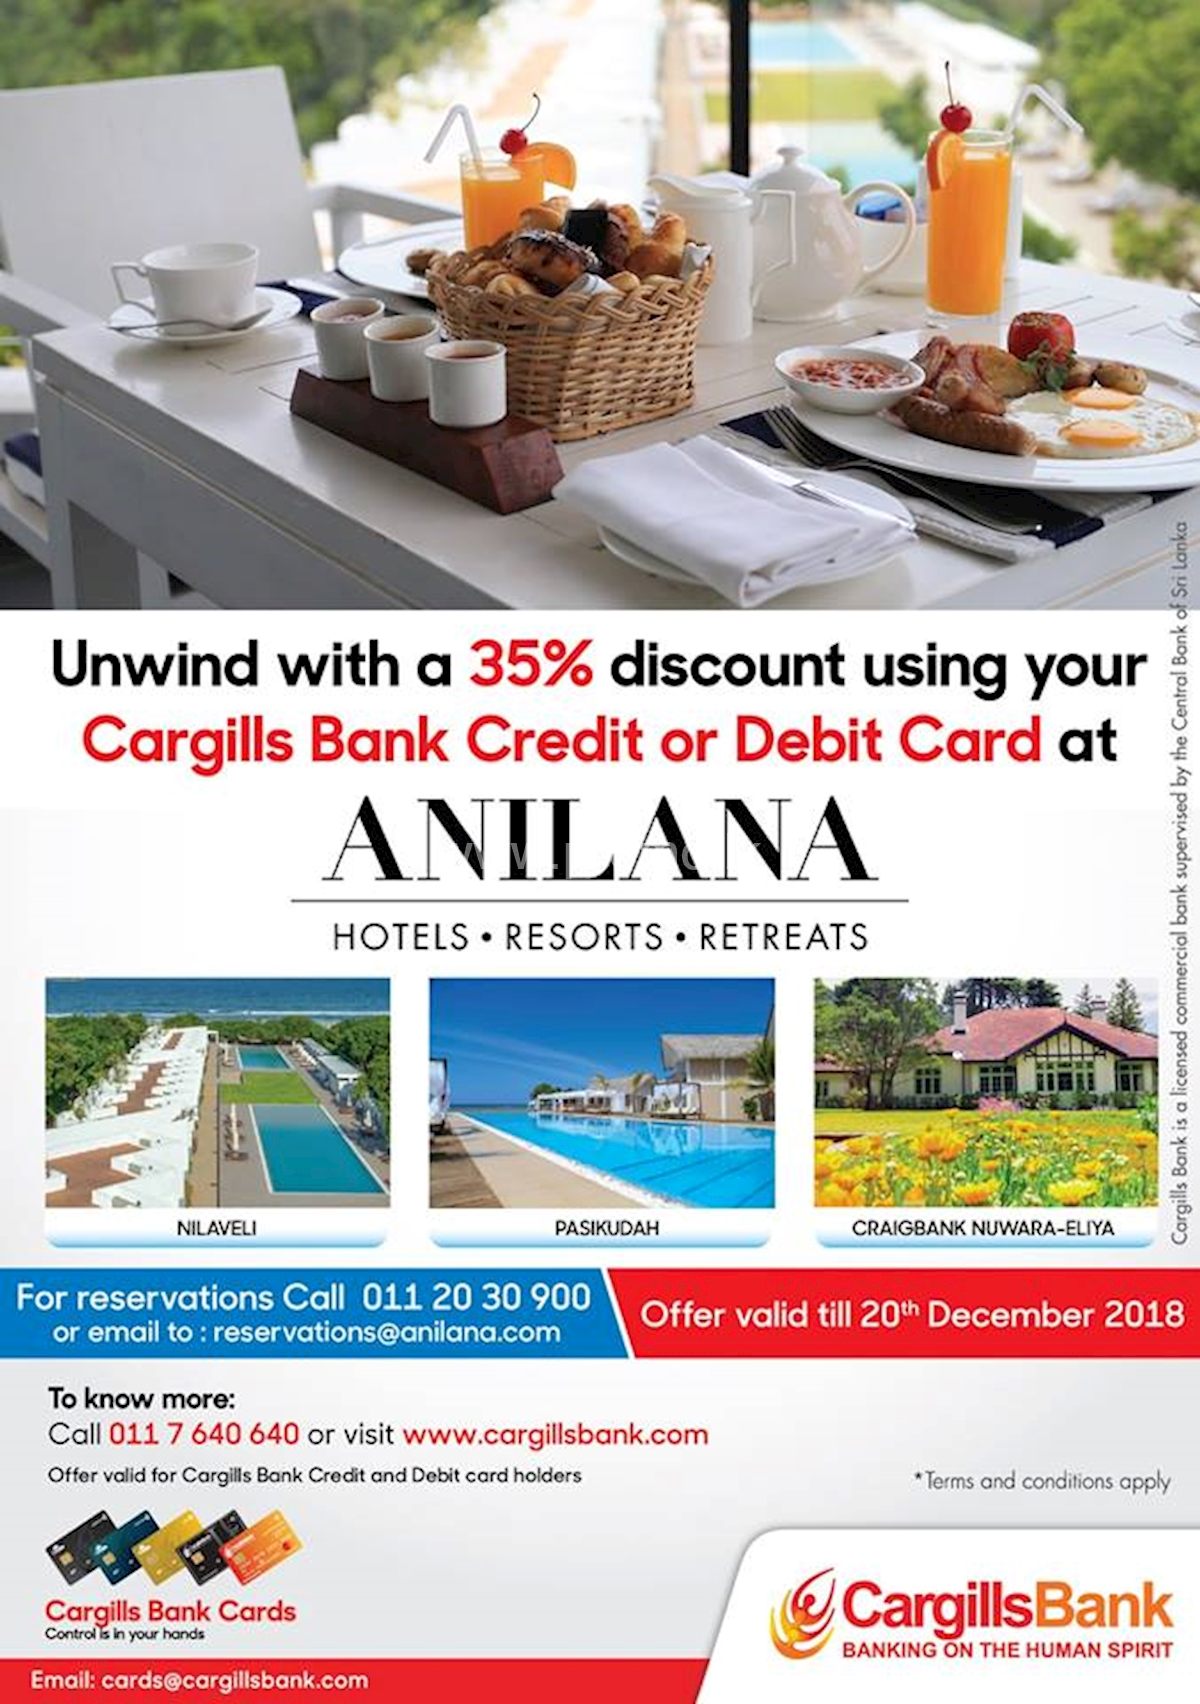 35% Off at Anilana Hotels for Cargills Bank Cardholders